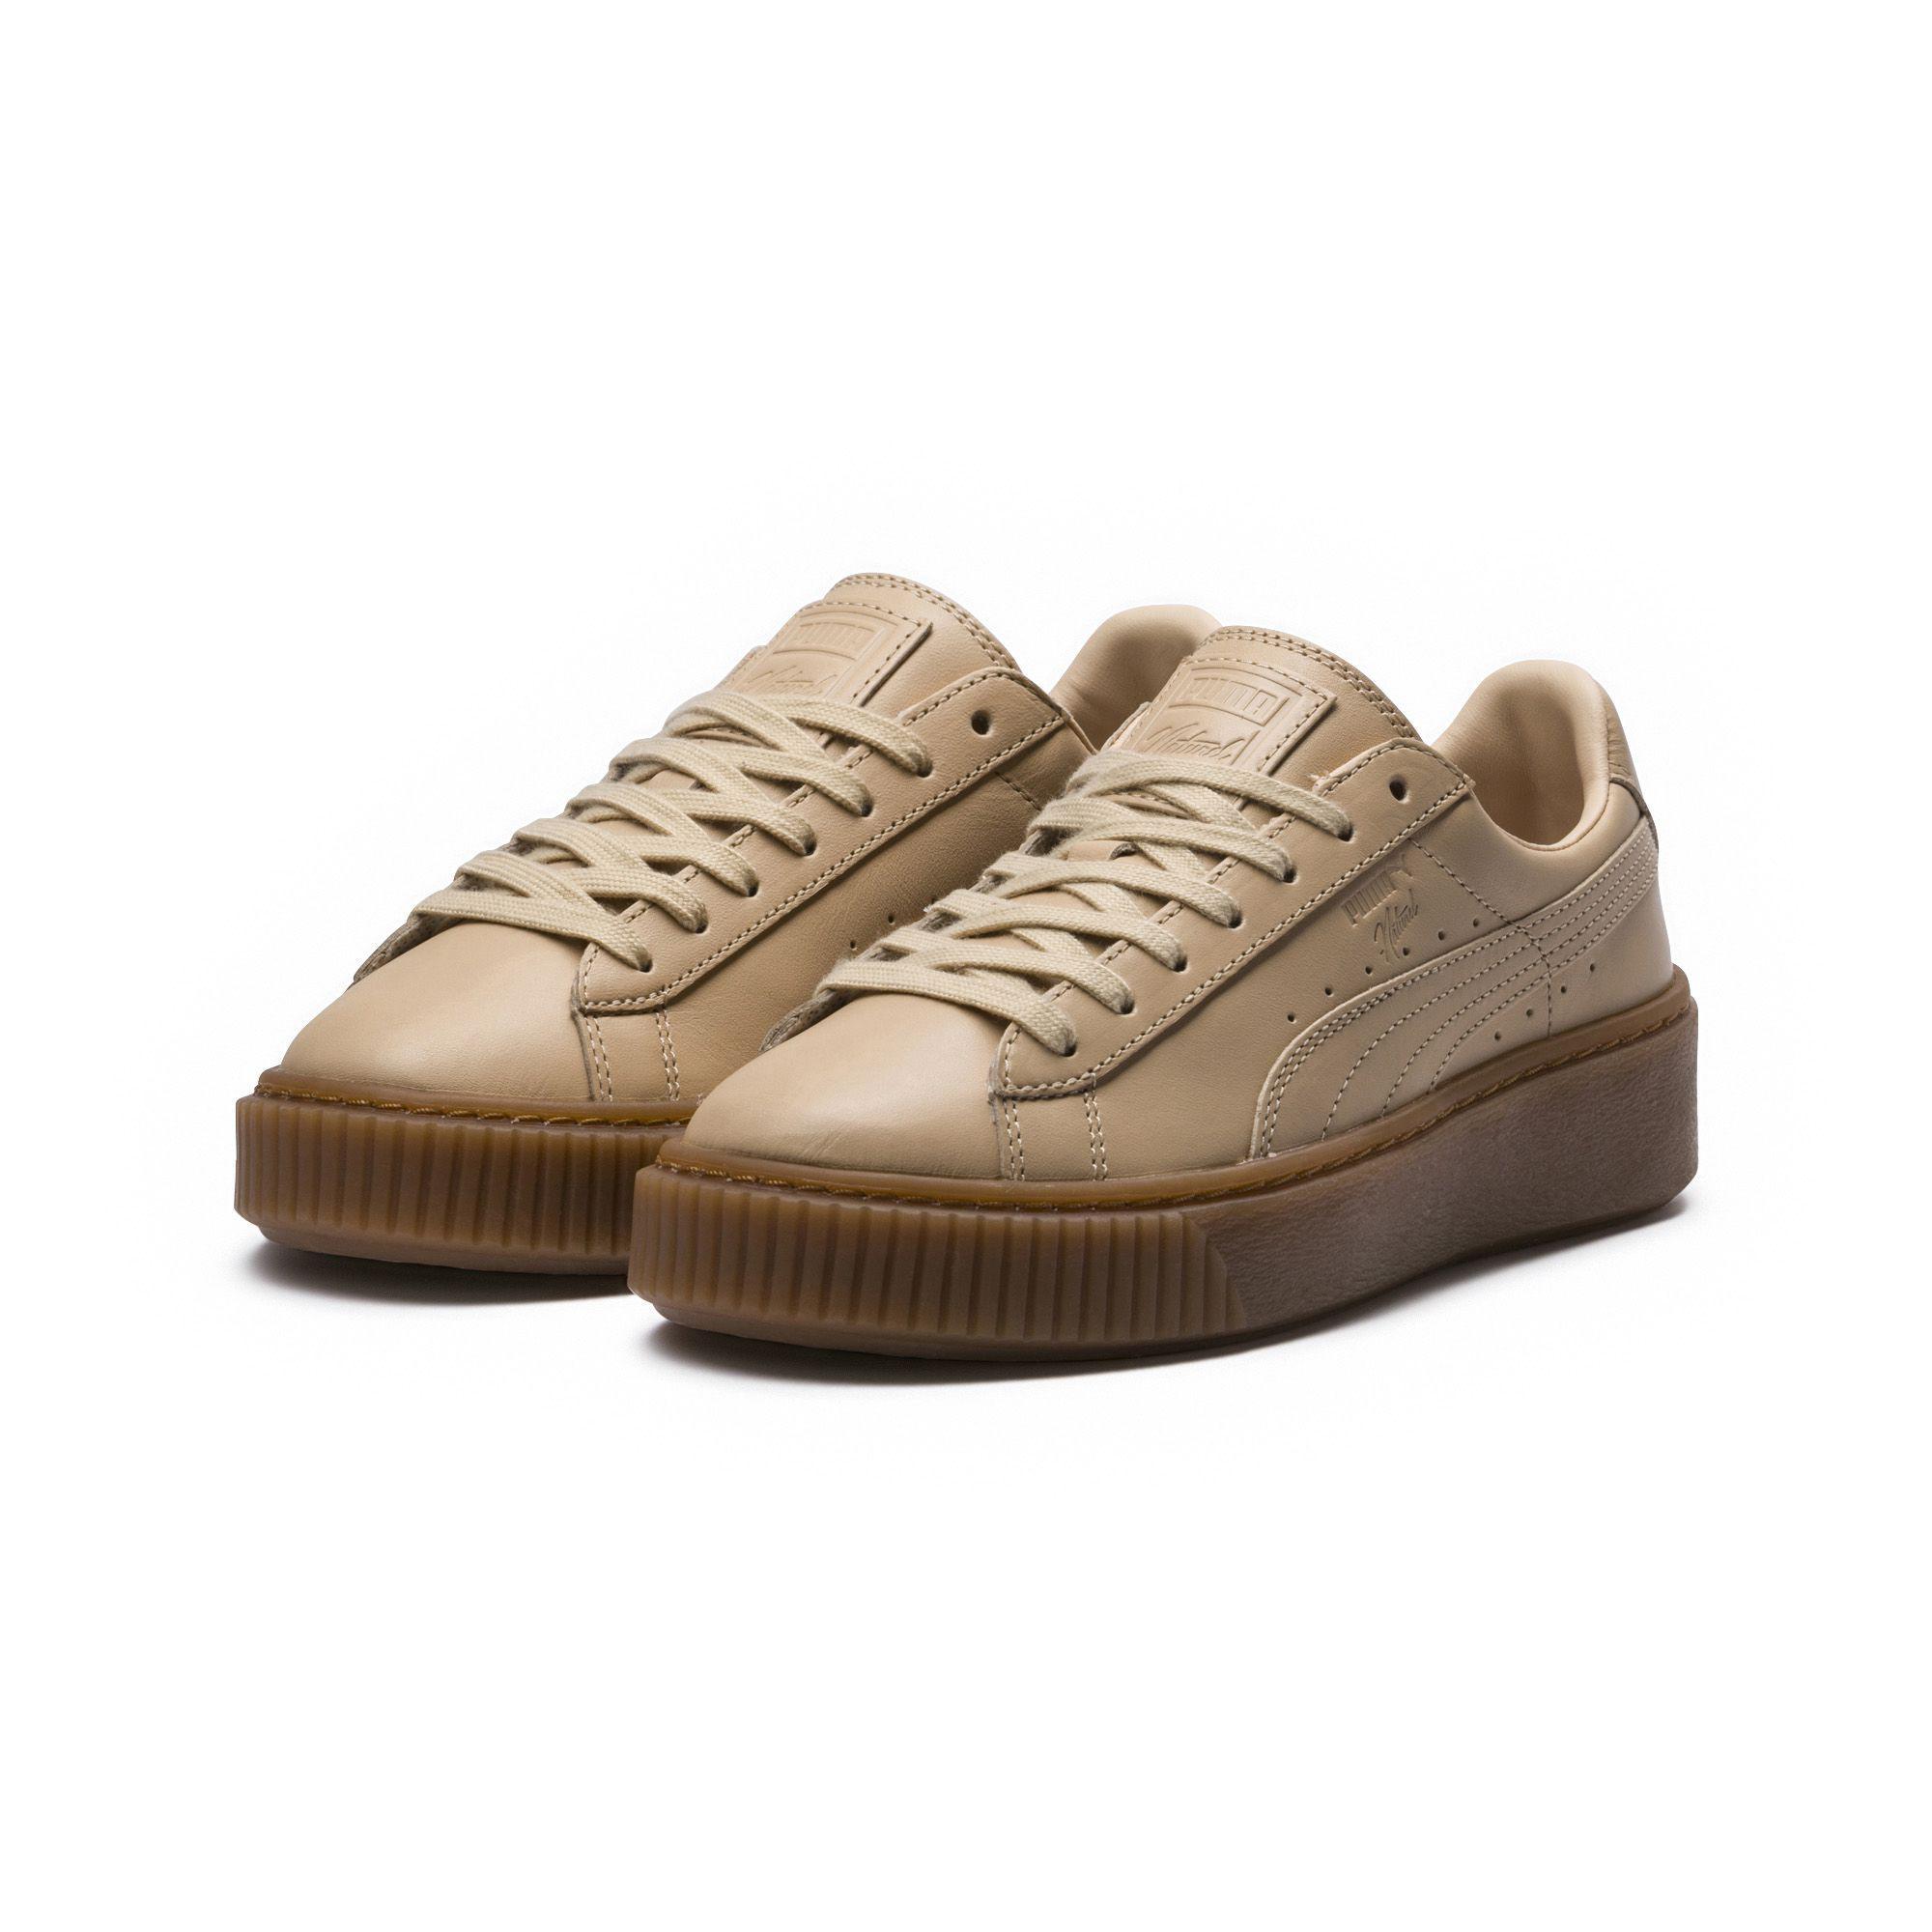 8deee70fc53ae1 Lyst - PUMA X Naturel Platform Veg Tan Women s Sneakers in Brown